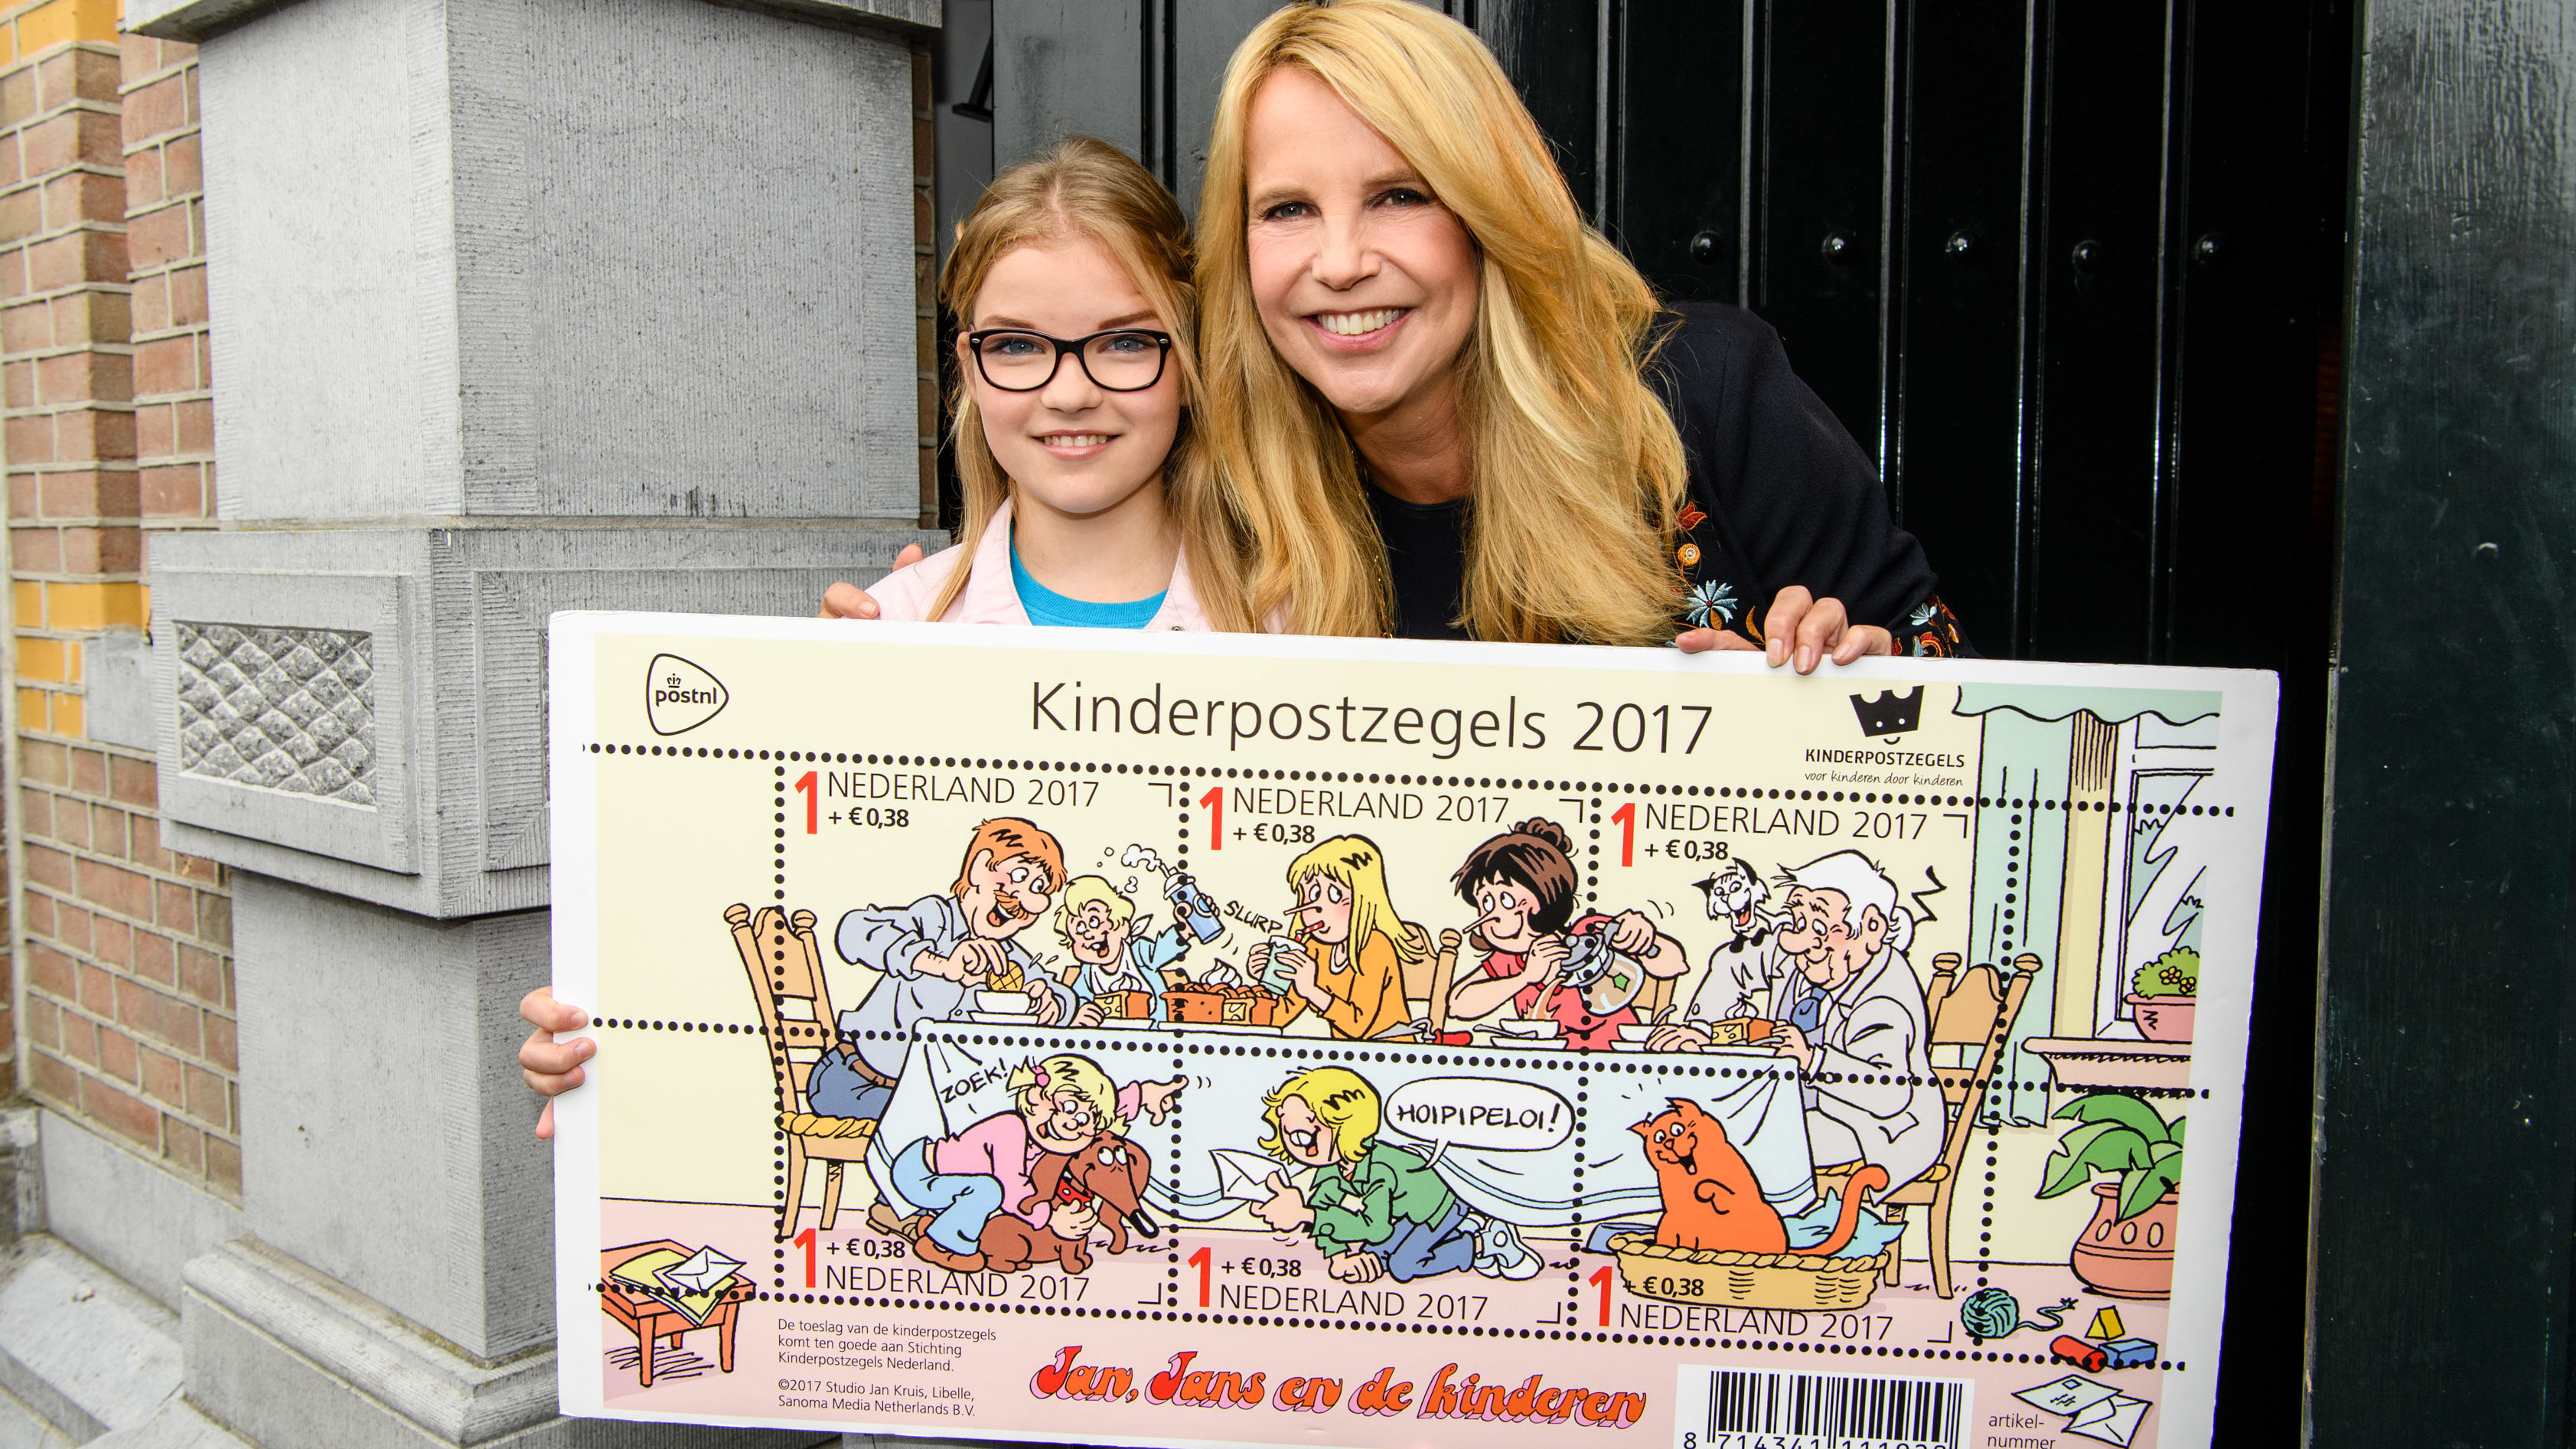 Dutch actress Linda de Mol helps to launch the 2017 Kinderpostzegels campaign. Photo taken on September 26, 2017.